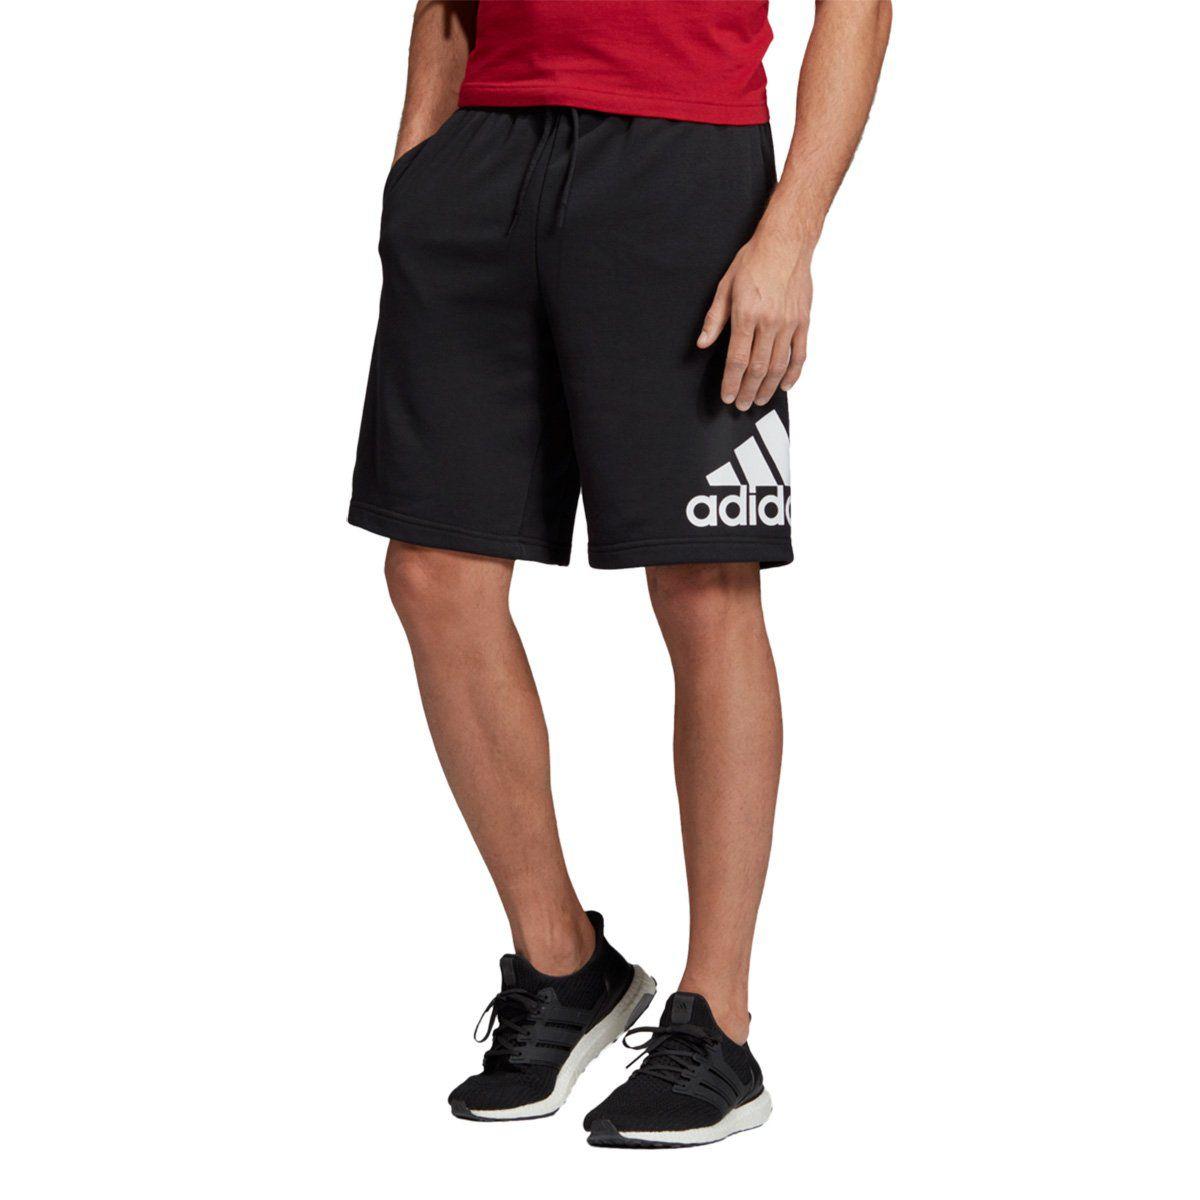 Bermuda Moletom Adidas Bosshort FT - Masculino - Preto e Branco